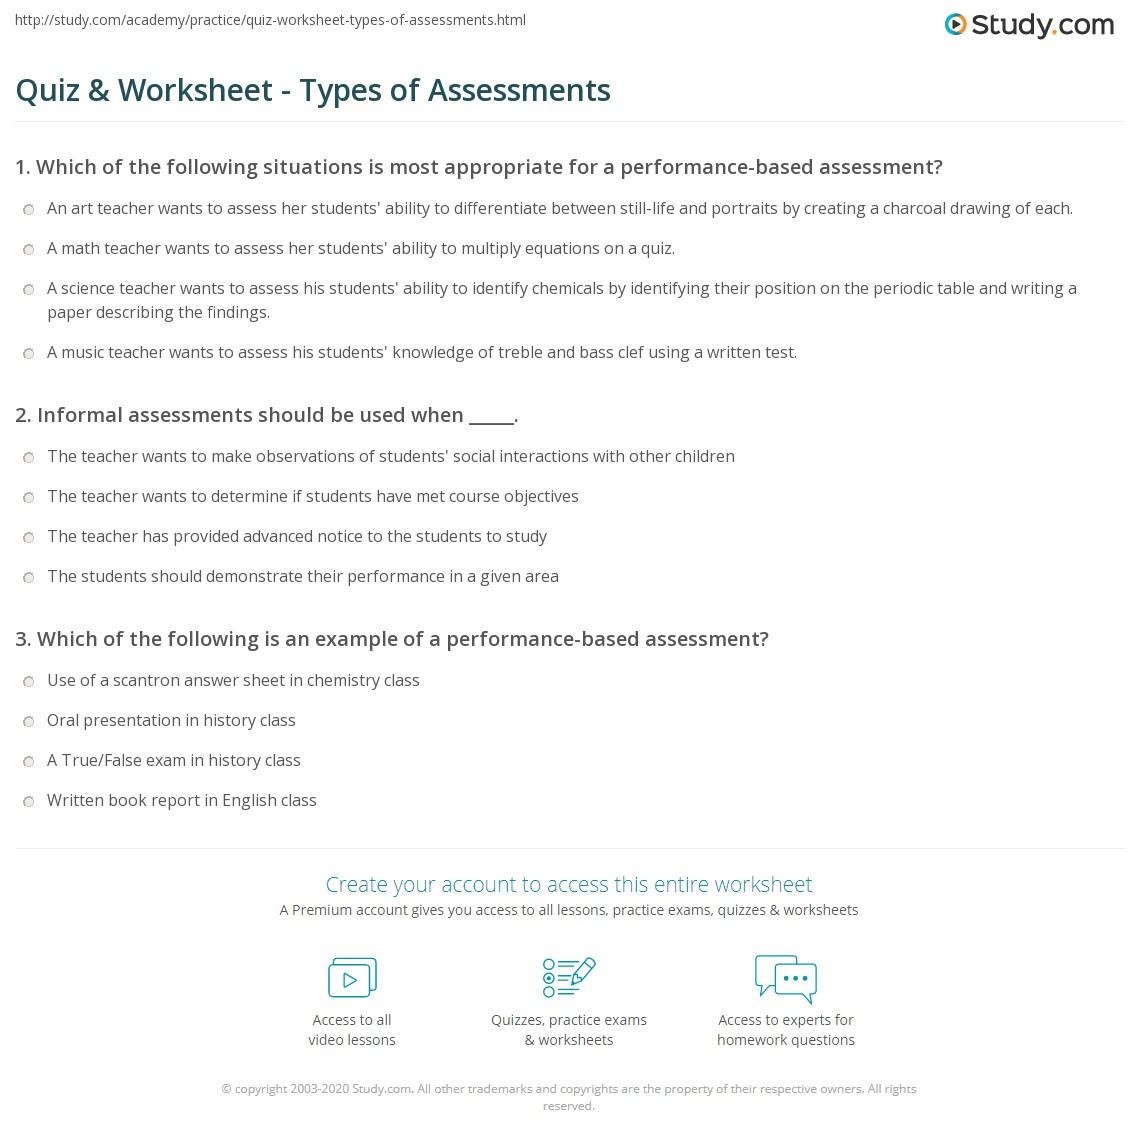 Quiz & Worksheet - Types of Assessments | Study.com